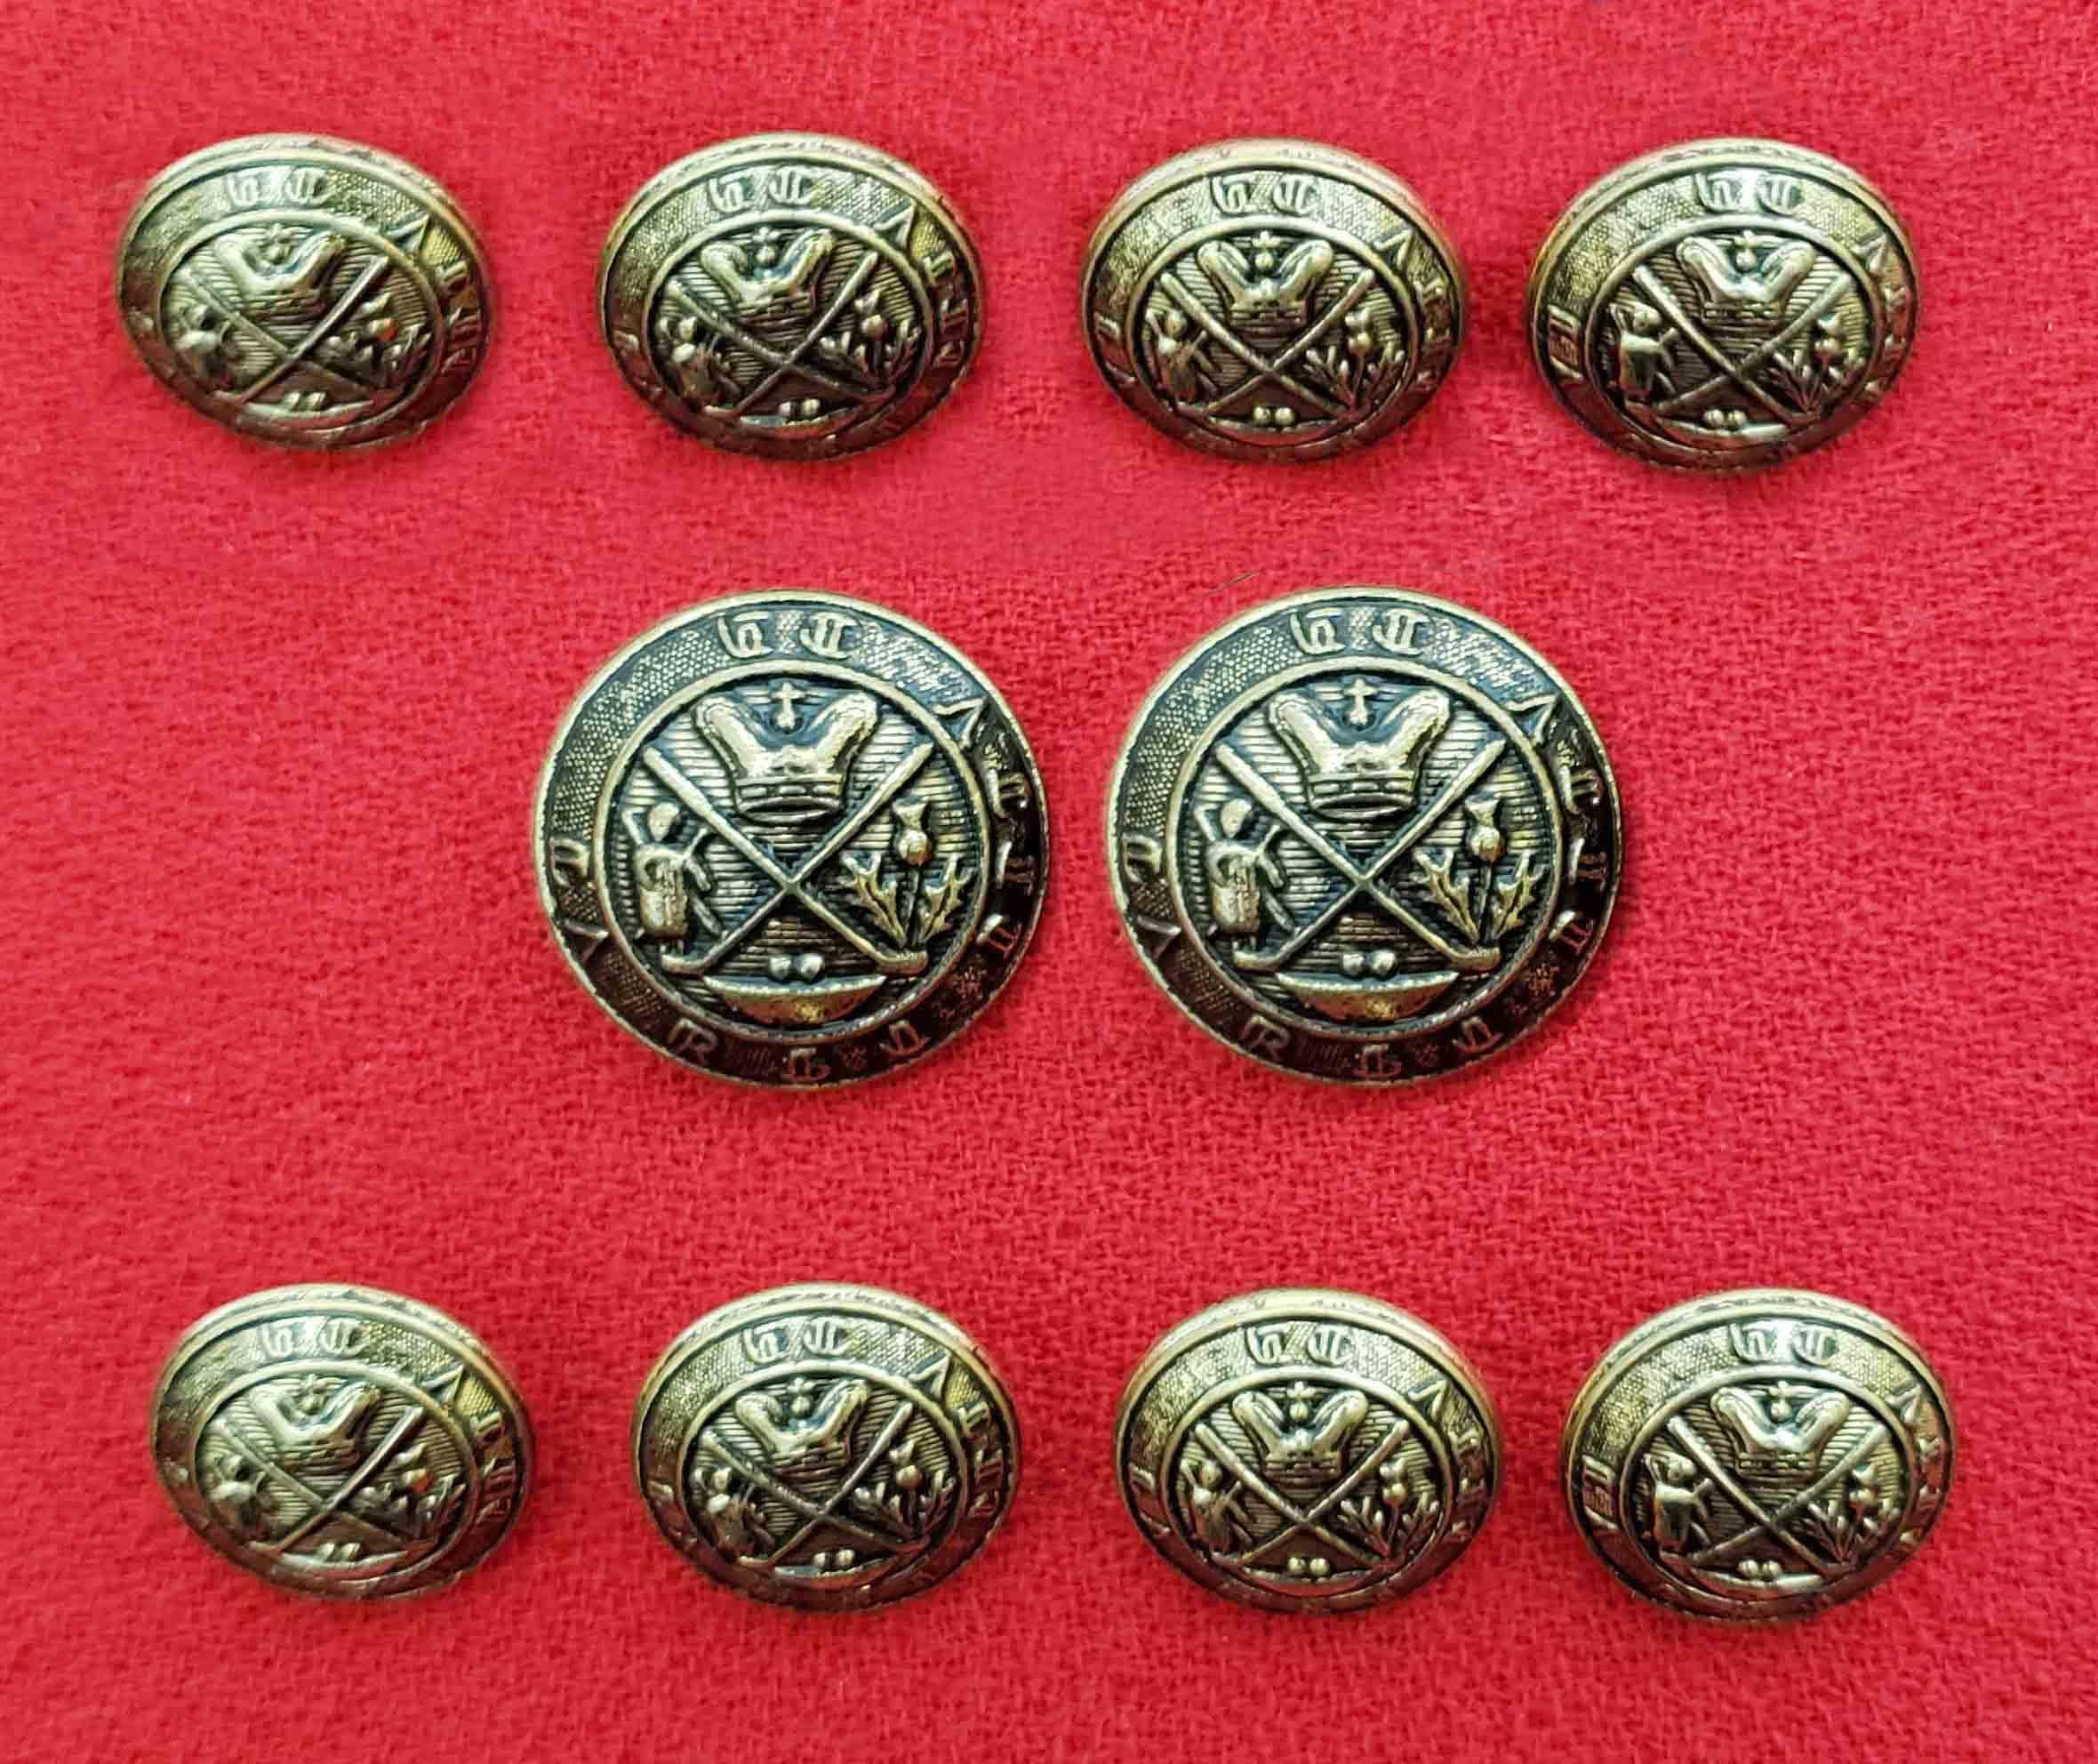 Club Room Blazer Buttons Set Antique Gold Royal Blackheath Golf Club Crest Pattern Men's